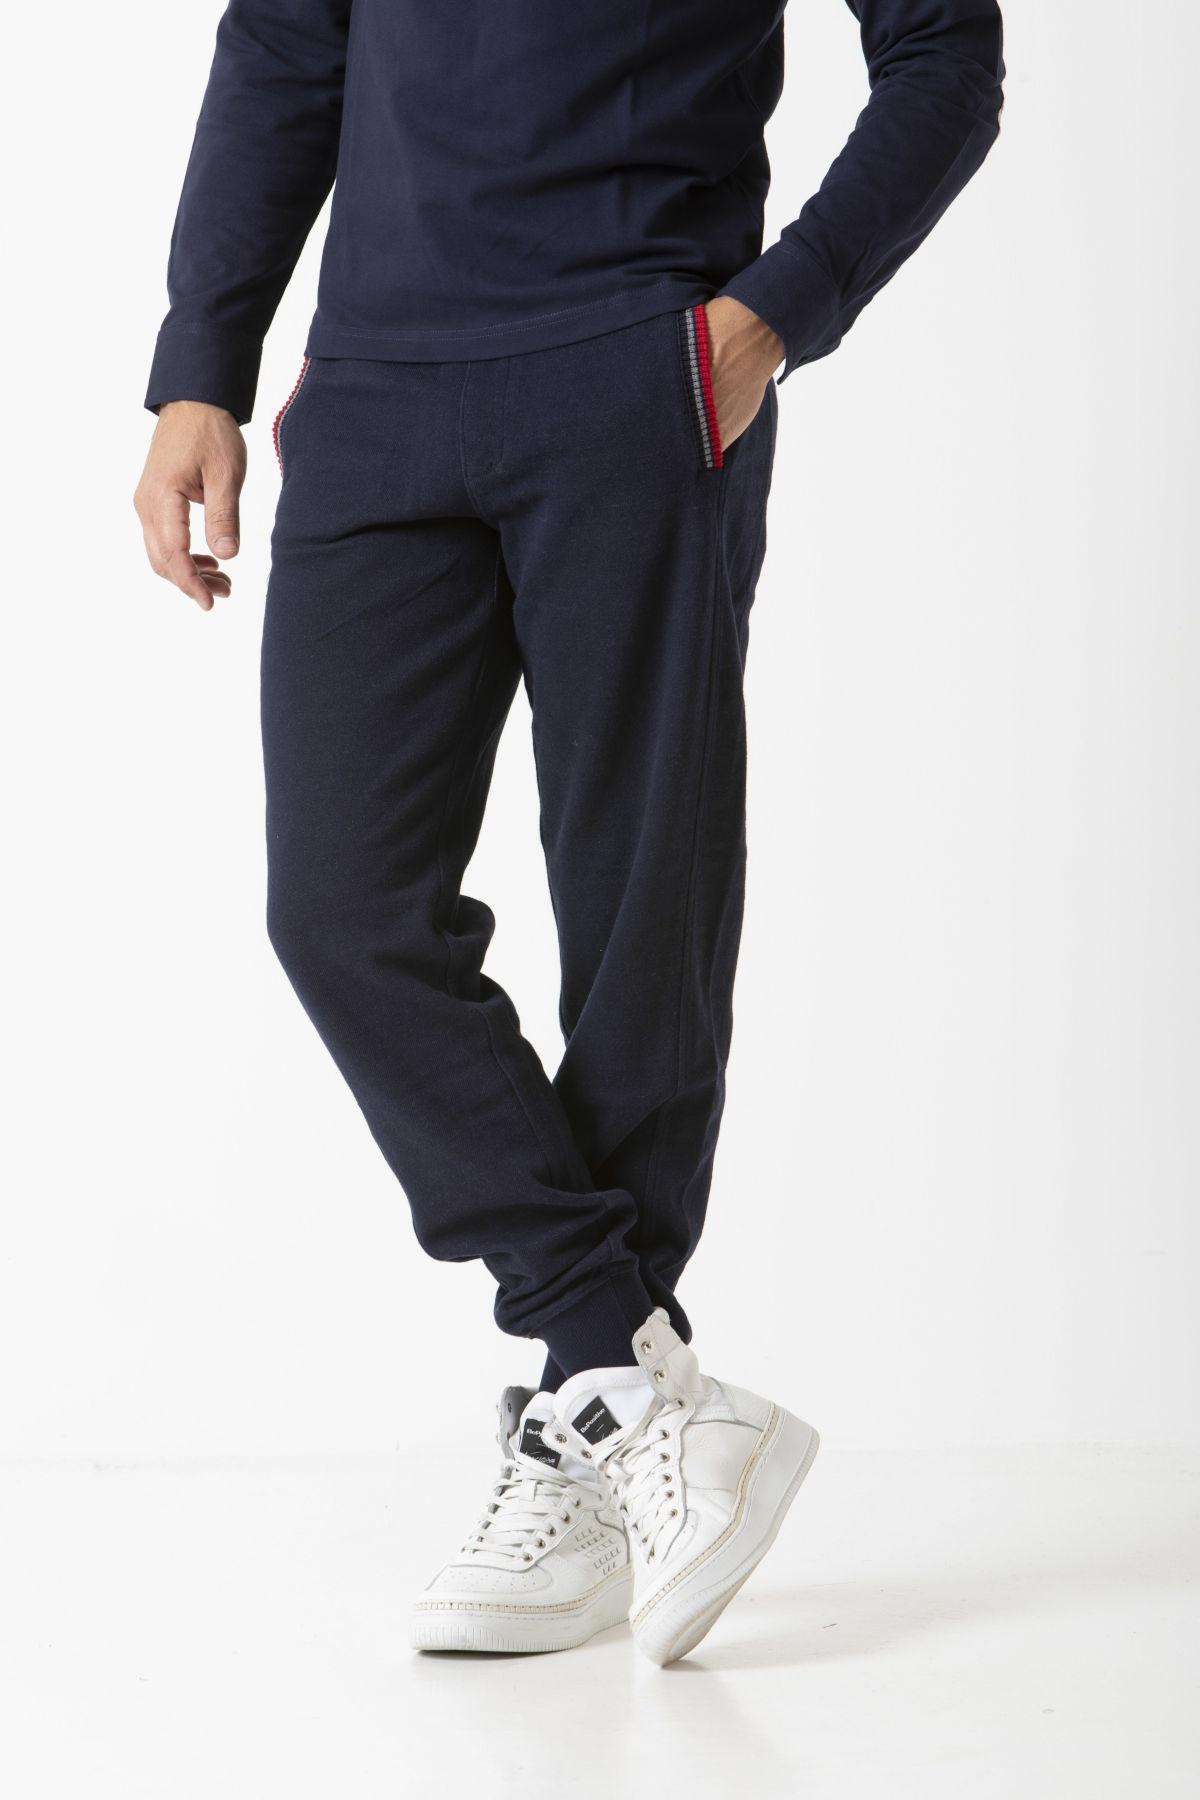 Pantaloni per uomo SUN68 A/I 19-20